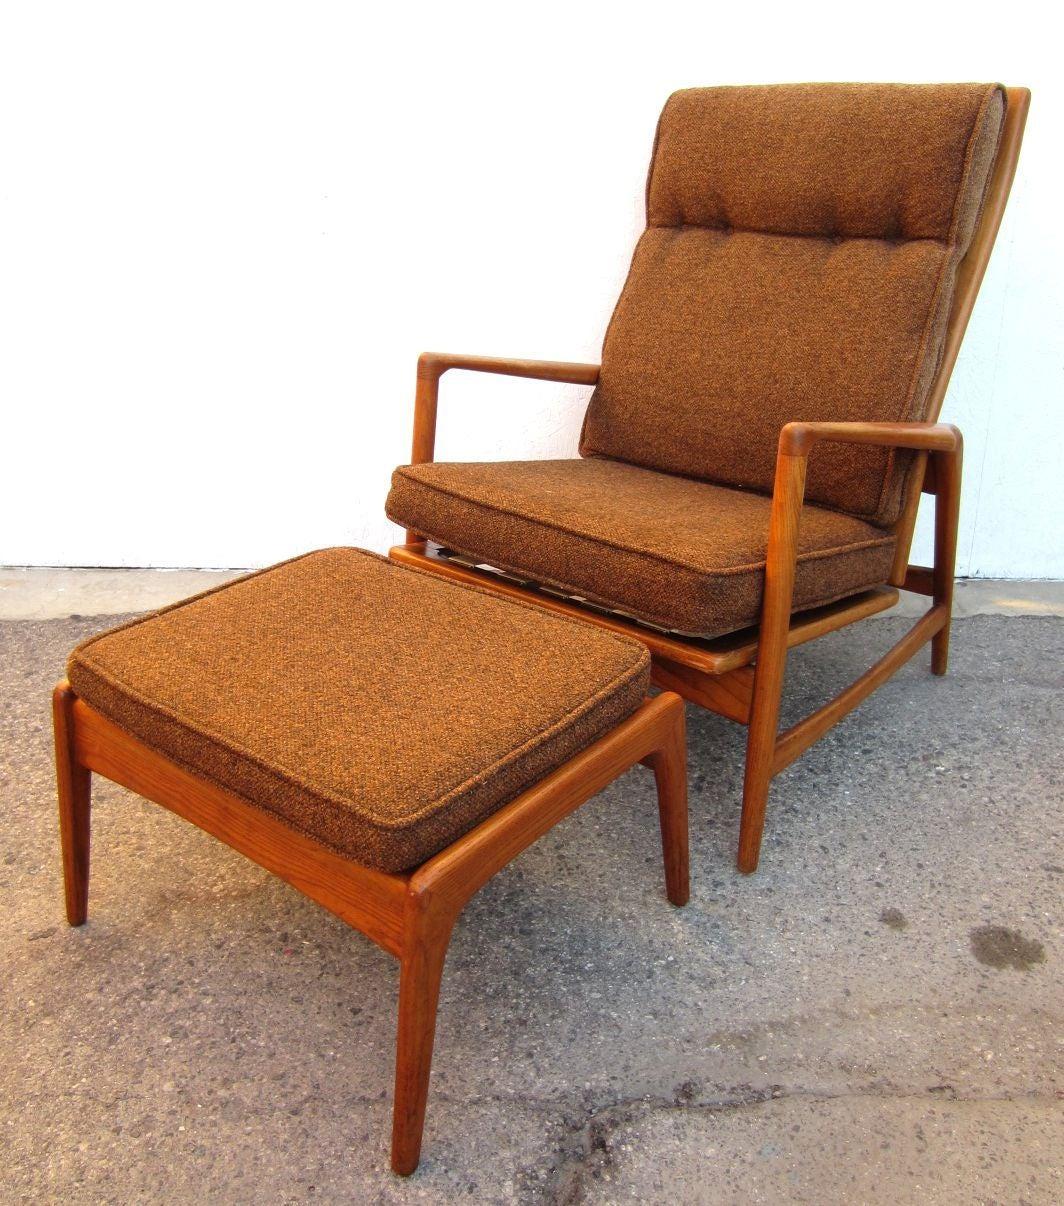 Superb Century Danish Lounge Chair Ib Danish Lounge Chair Ib Kofod Lounge Chairs Ottoman furniture Modern Lounge Chairs With Ottoman